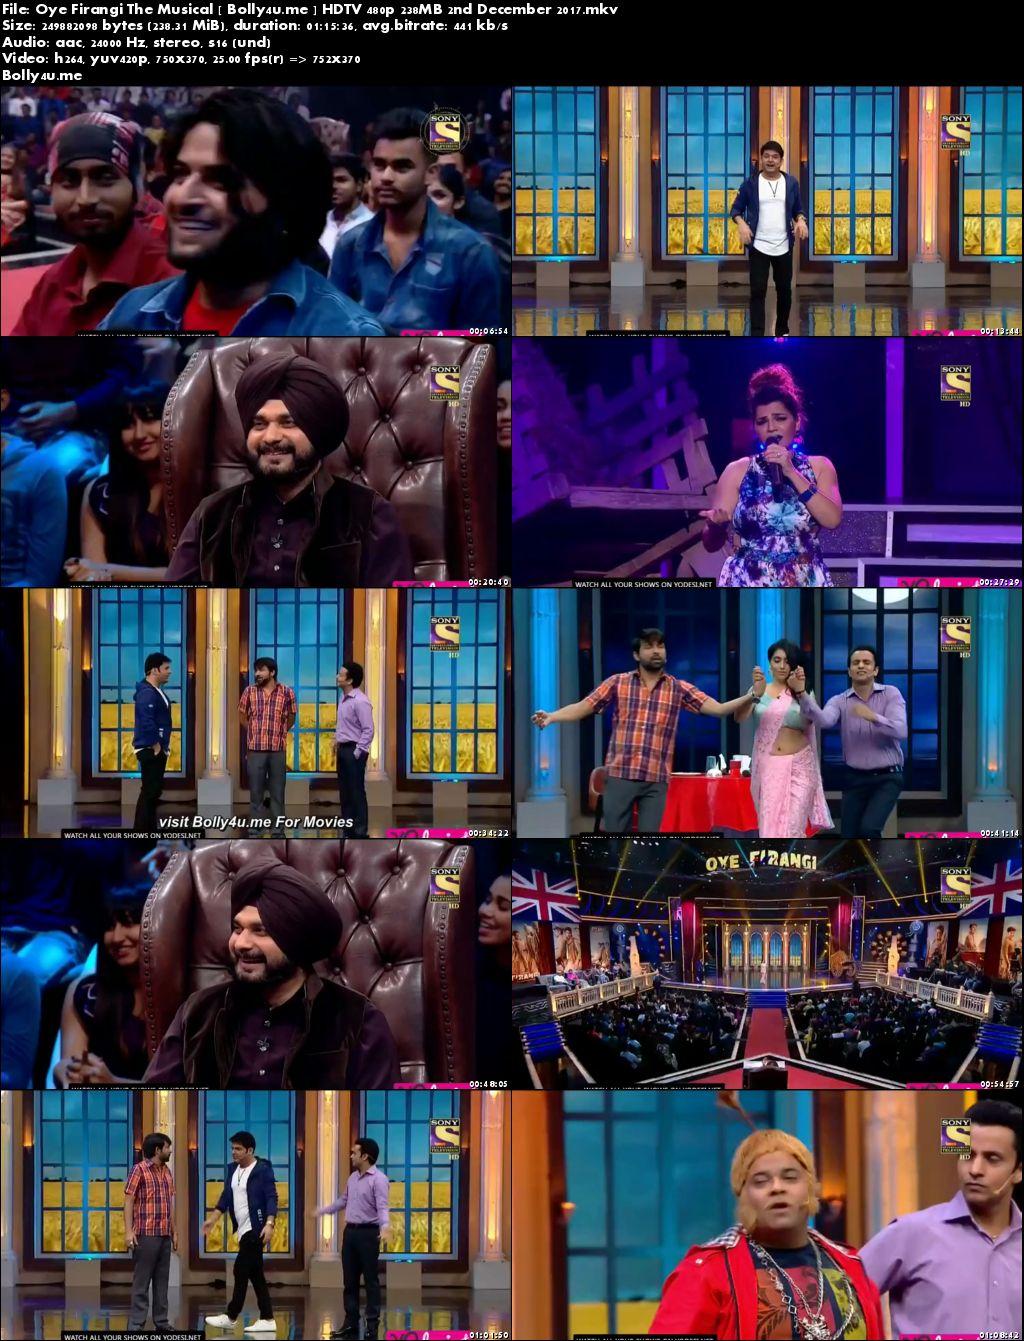 Oye Firangi The Musical HDTV 480p 200MB 02 December 2017 Download